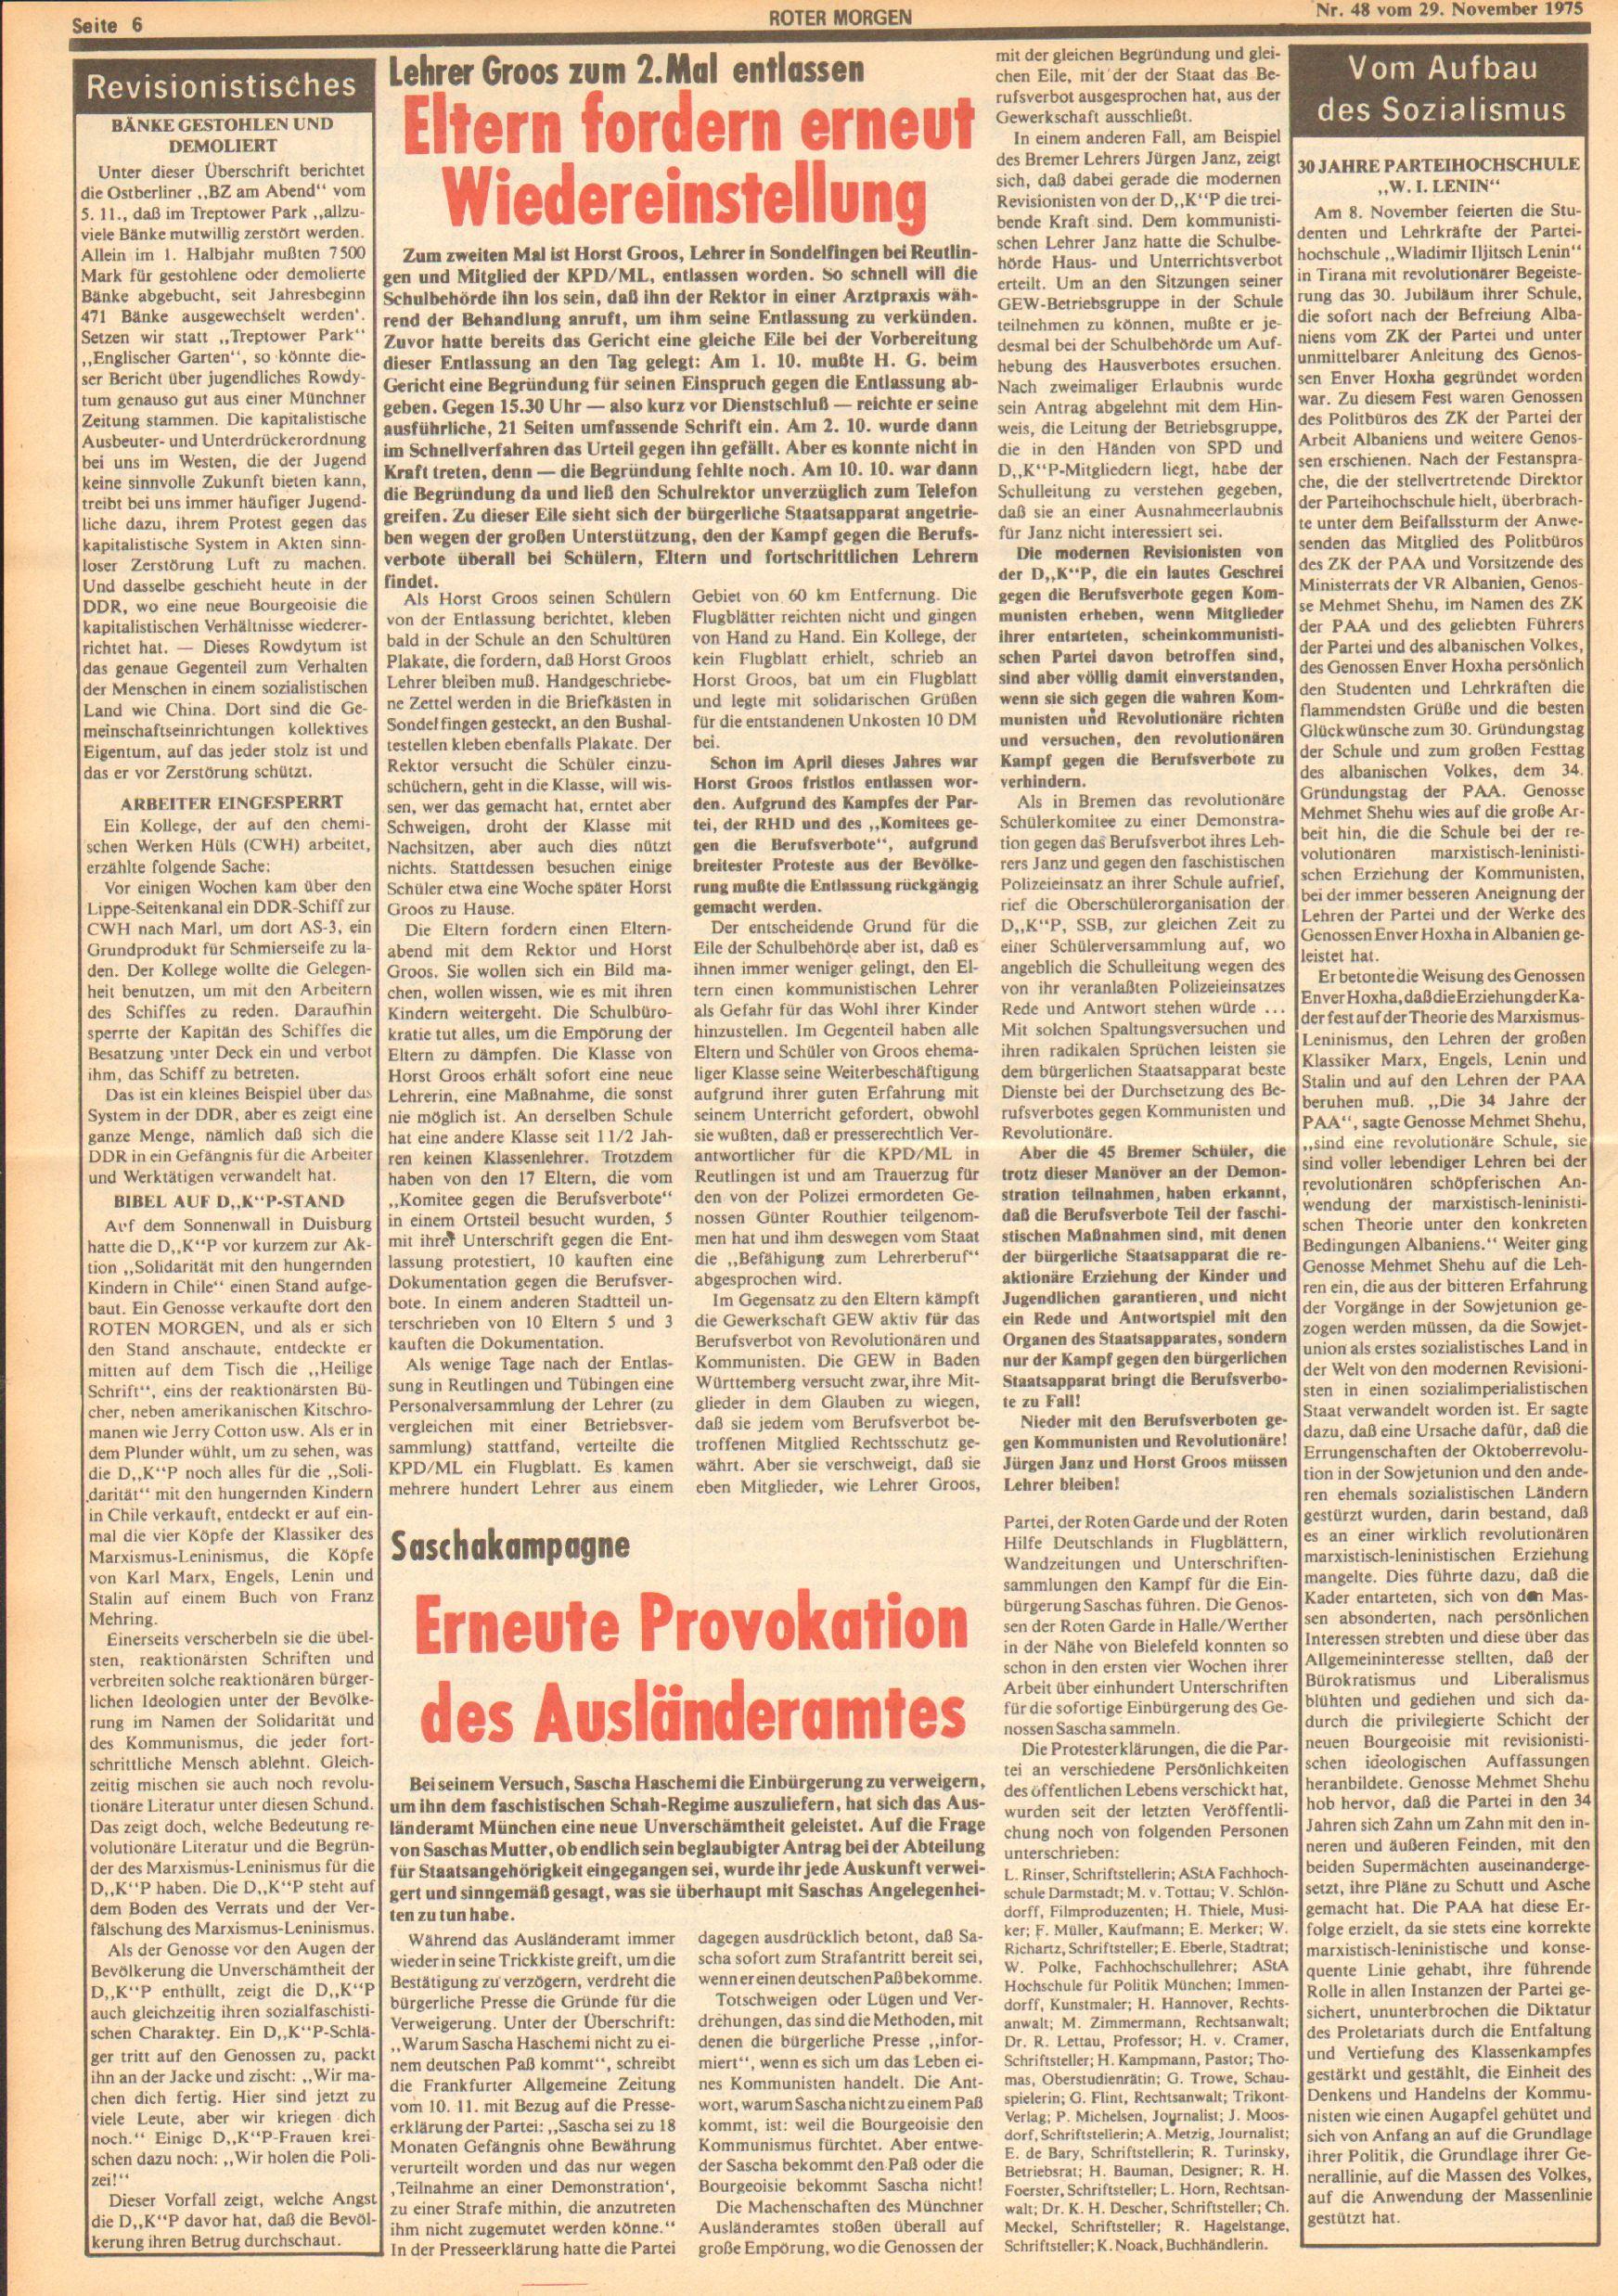 Roter Morgen, 9. Jg., 29. November 1975, Nr. 48, Seite 6